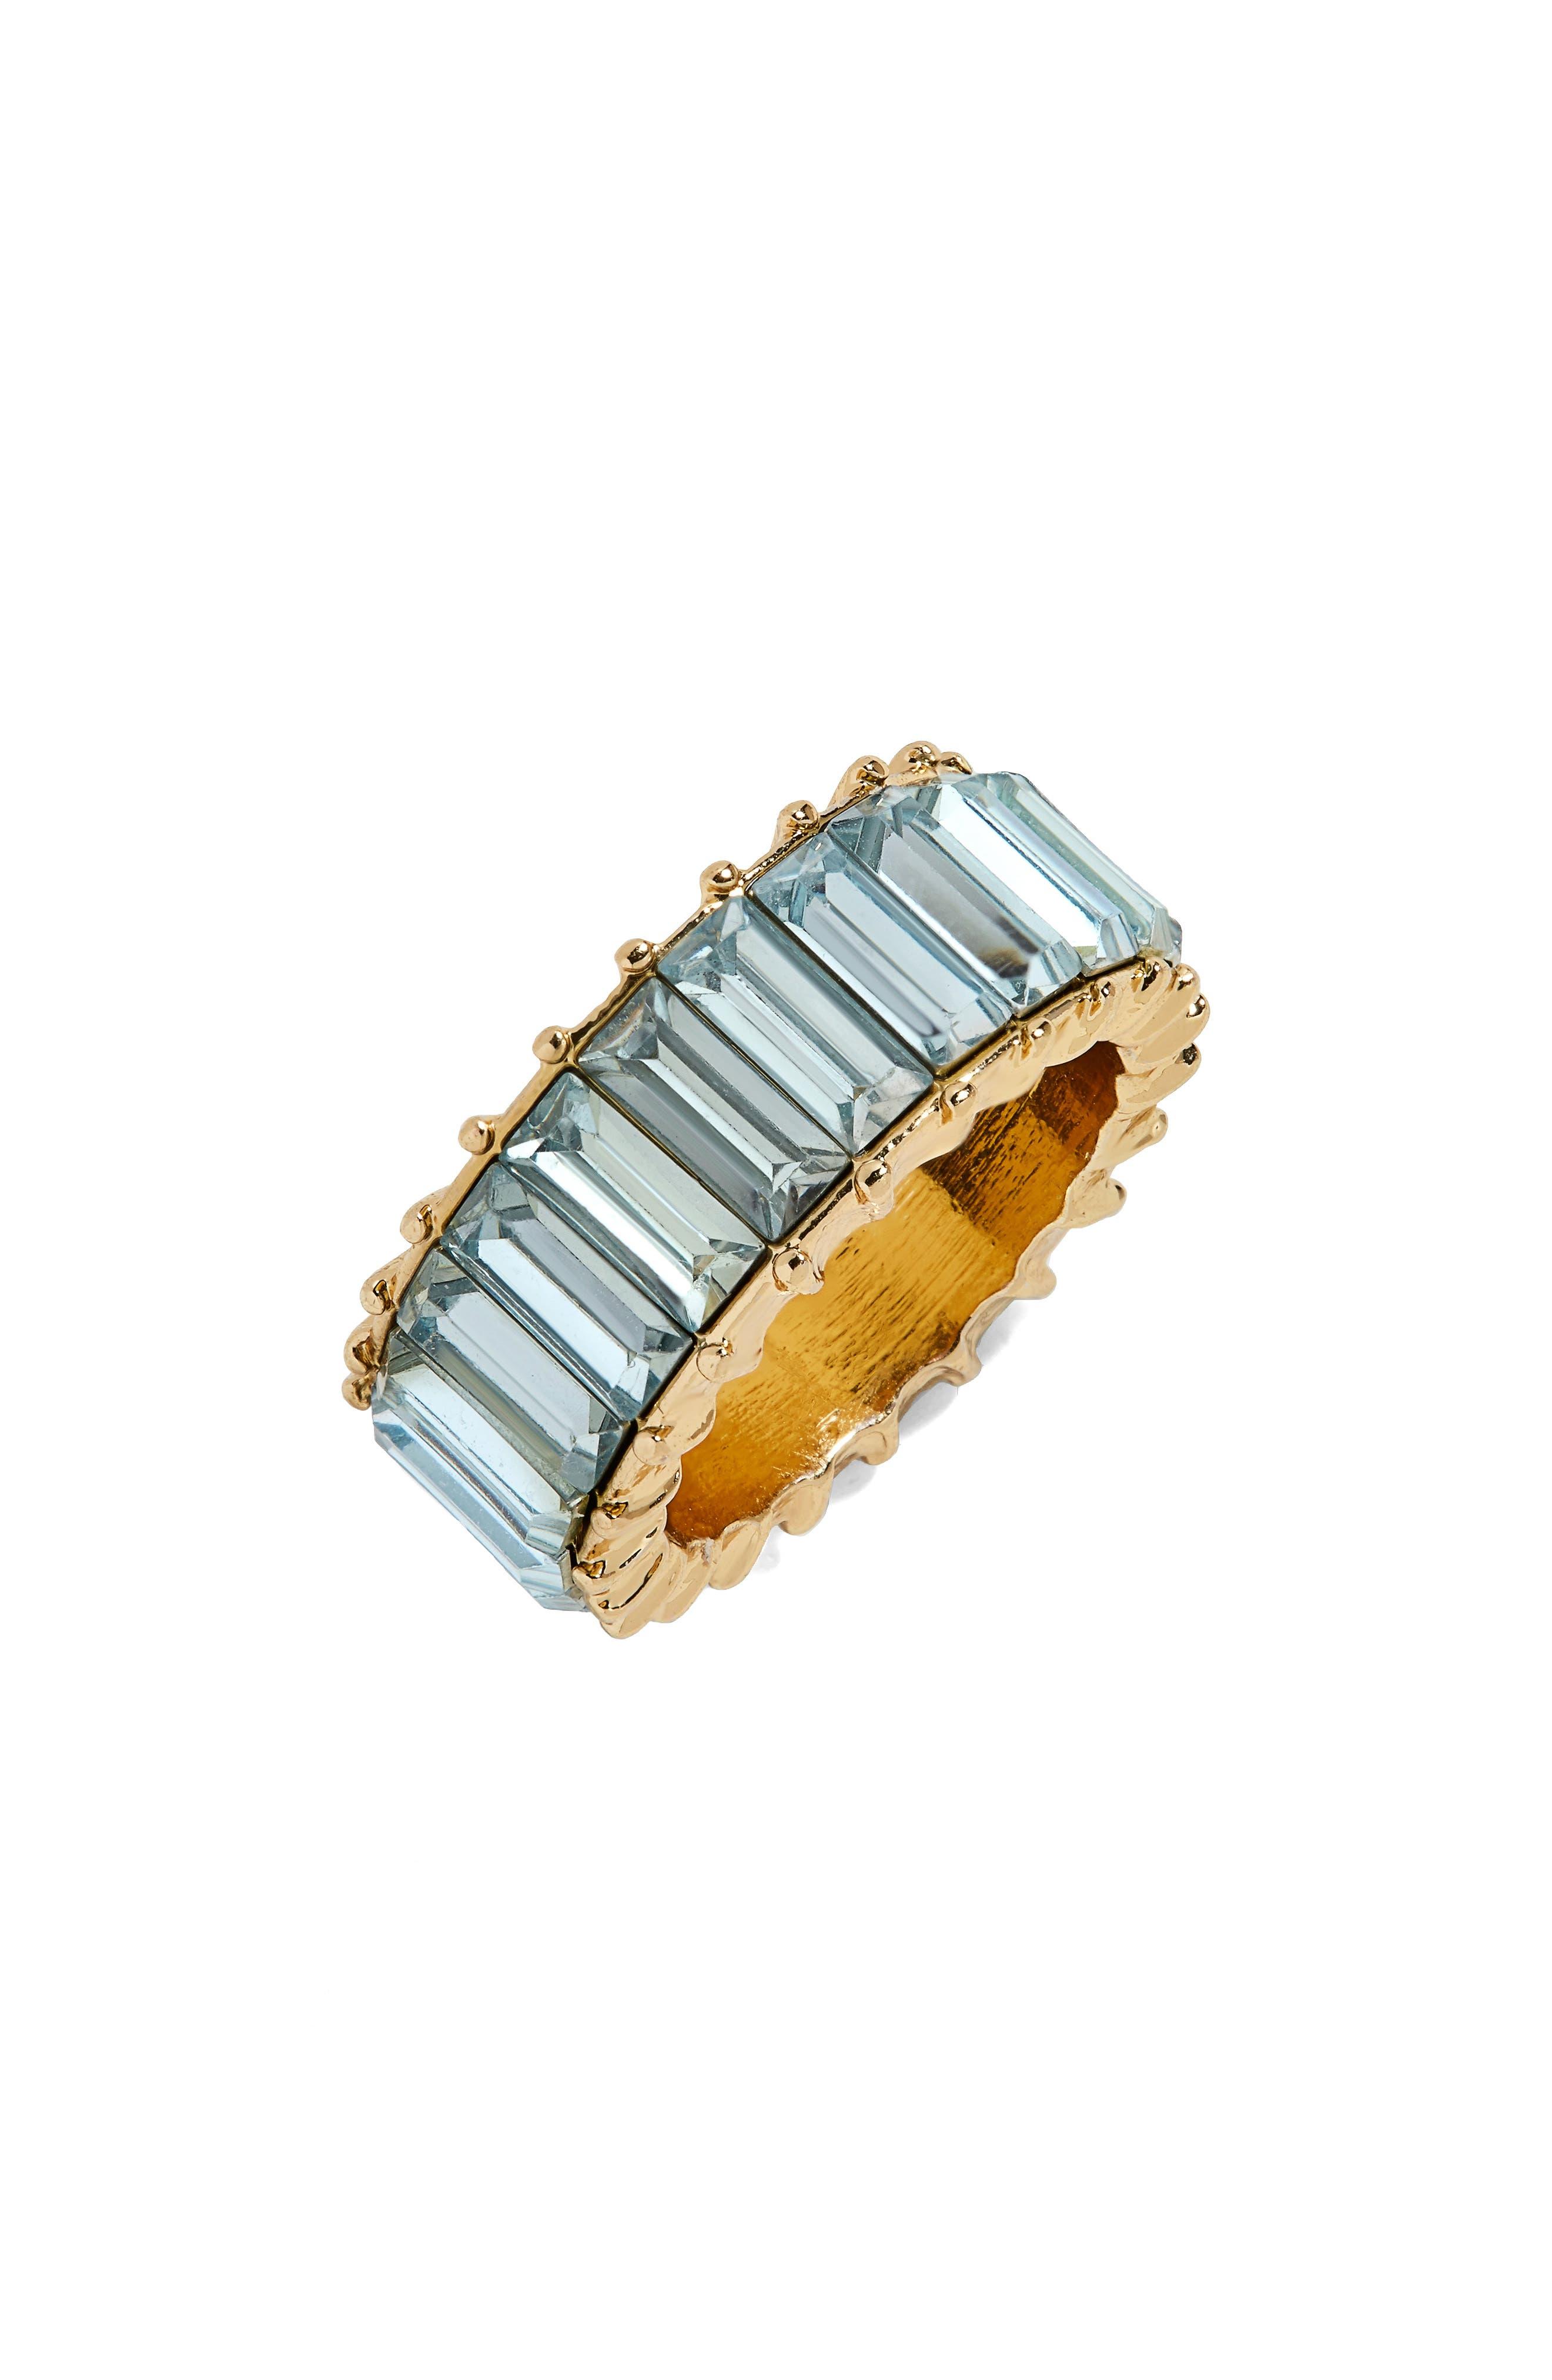 BAUBLEBAR Alidia Ring, Main, color, LIGHT BLUE